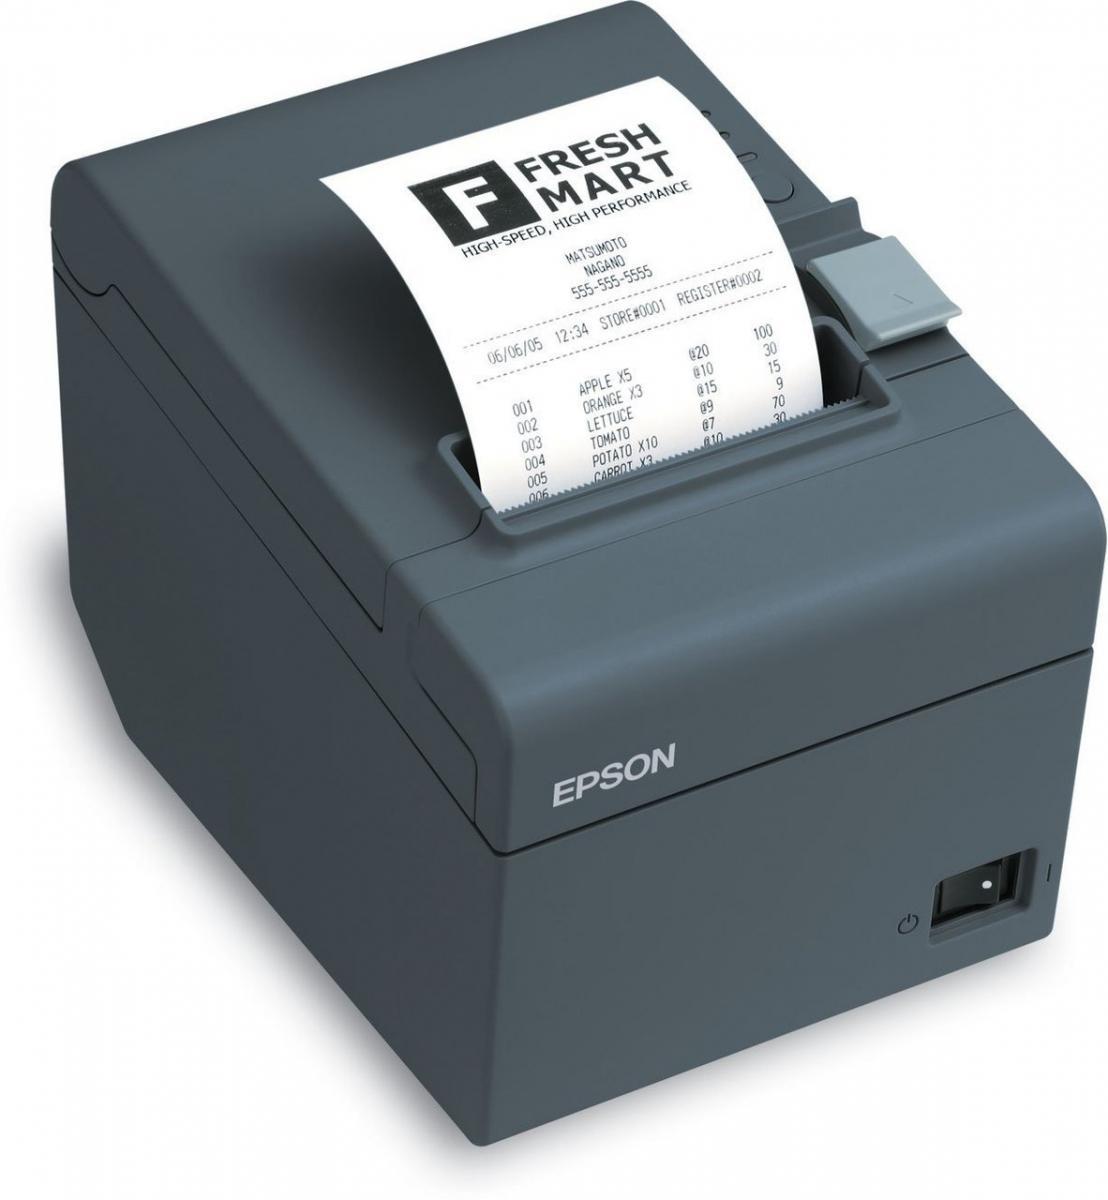 Epson TM-T20II termální tiskárna, USB + RS232, černá C31CD52002